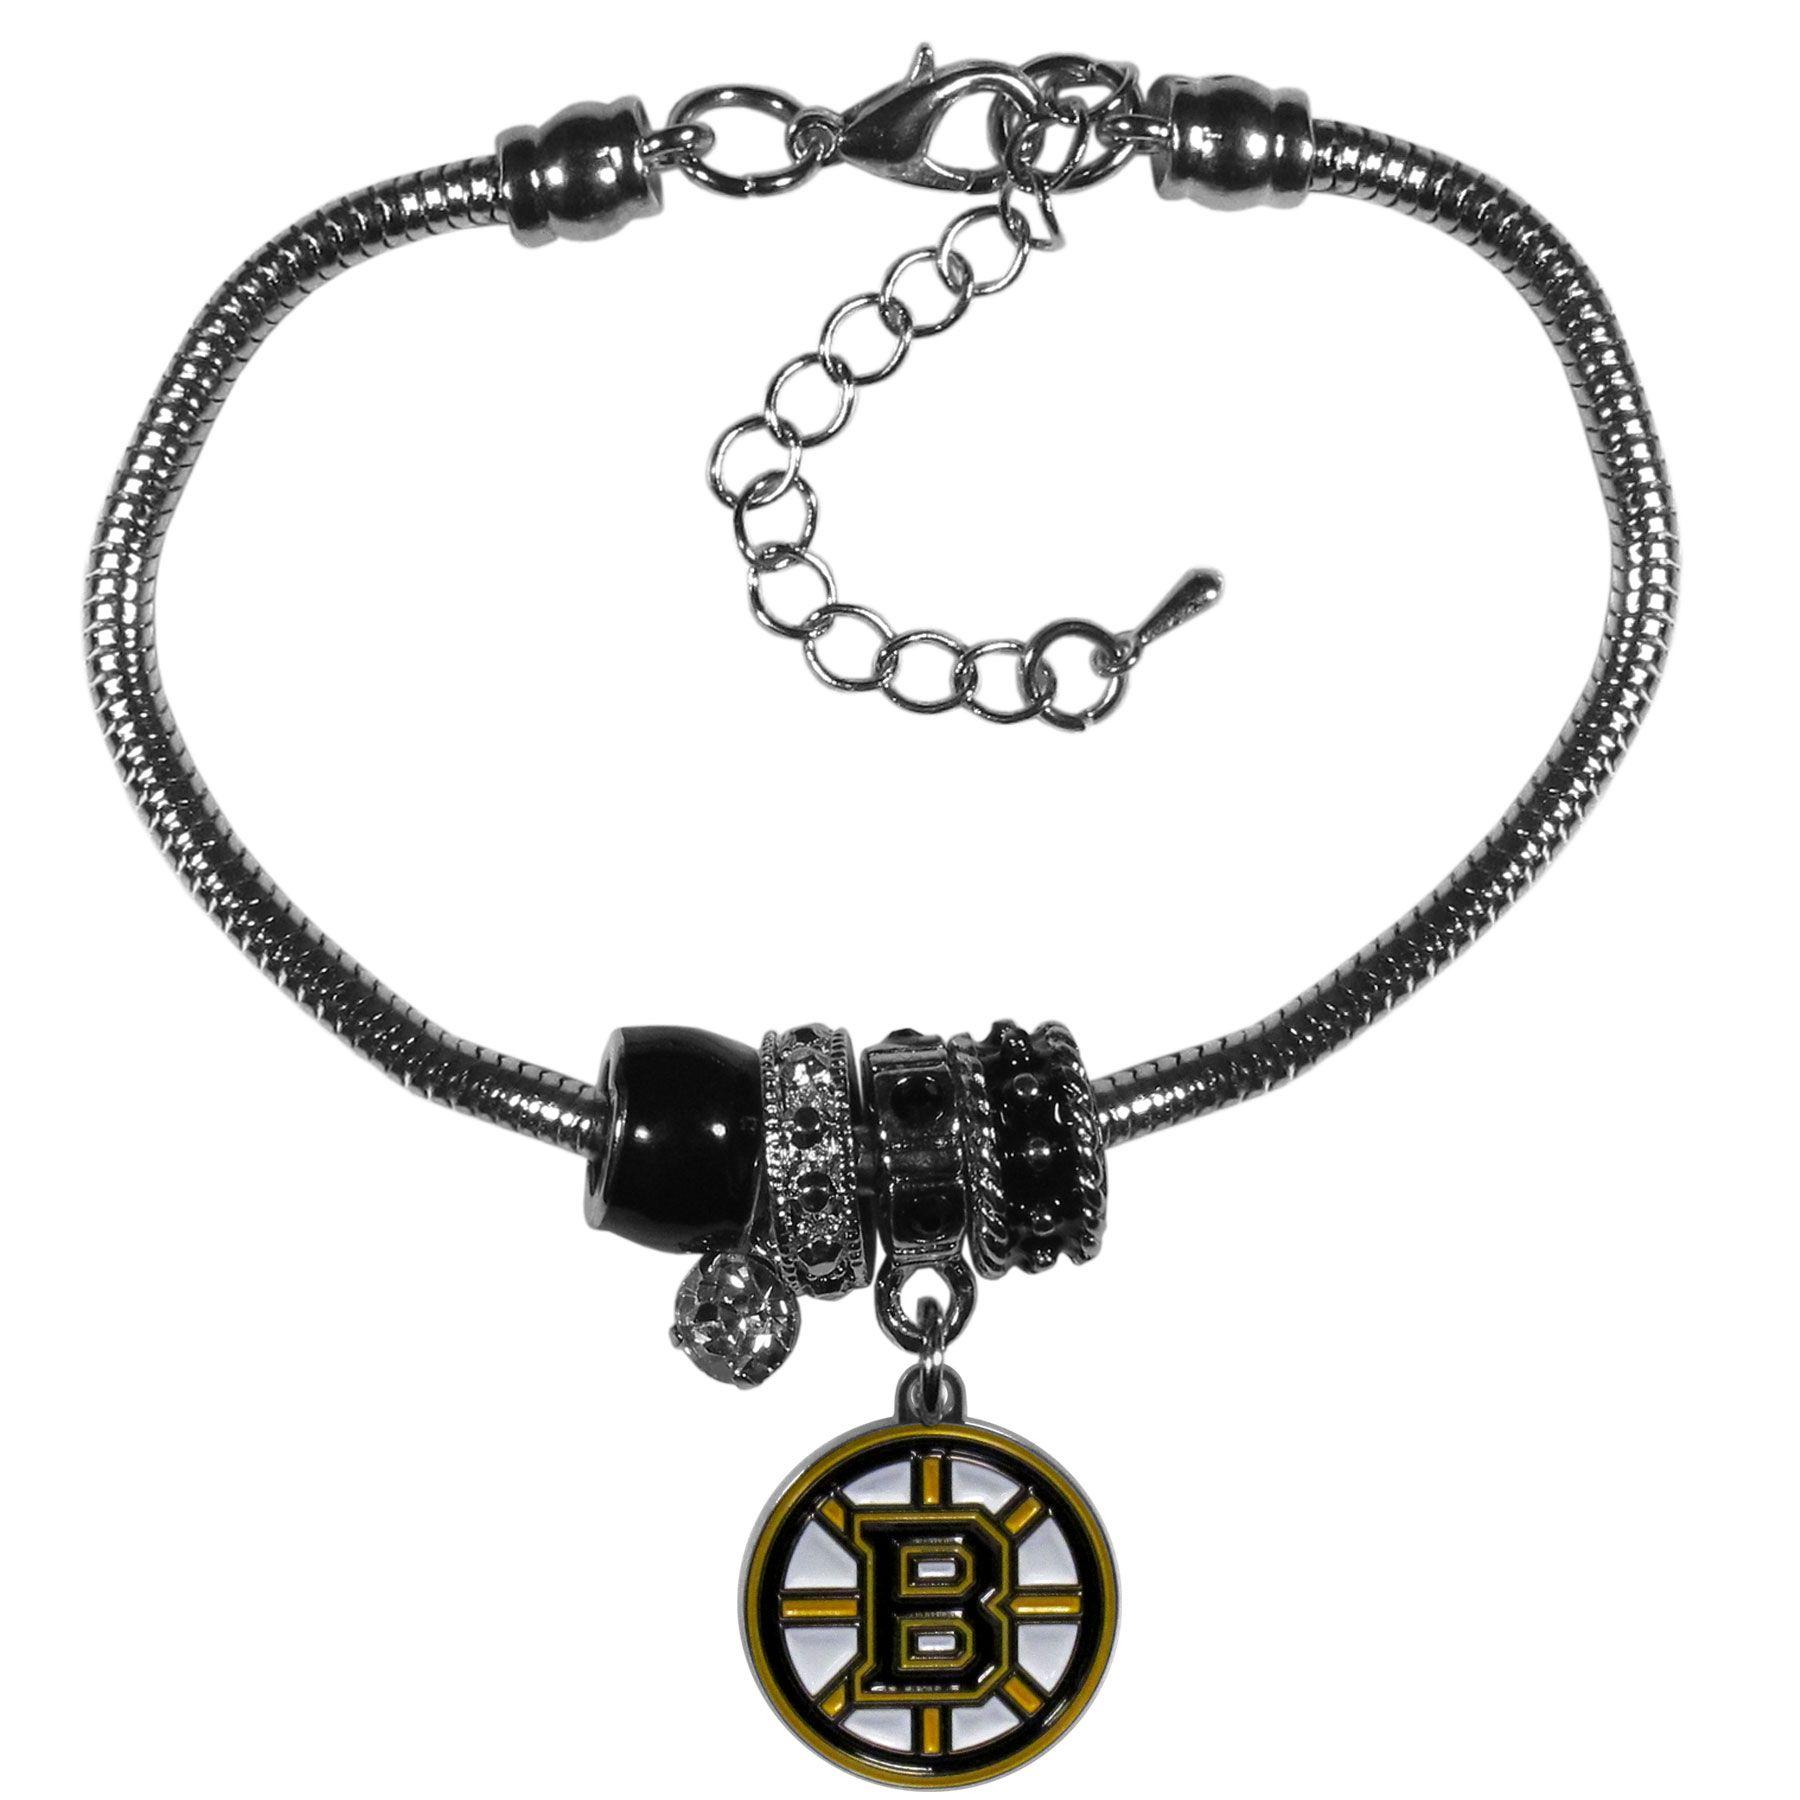 Siskiyou NHL Womens Knotted Choker